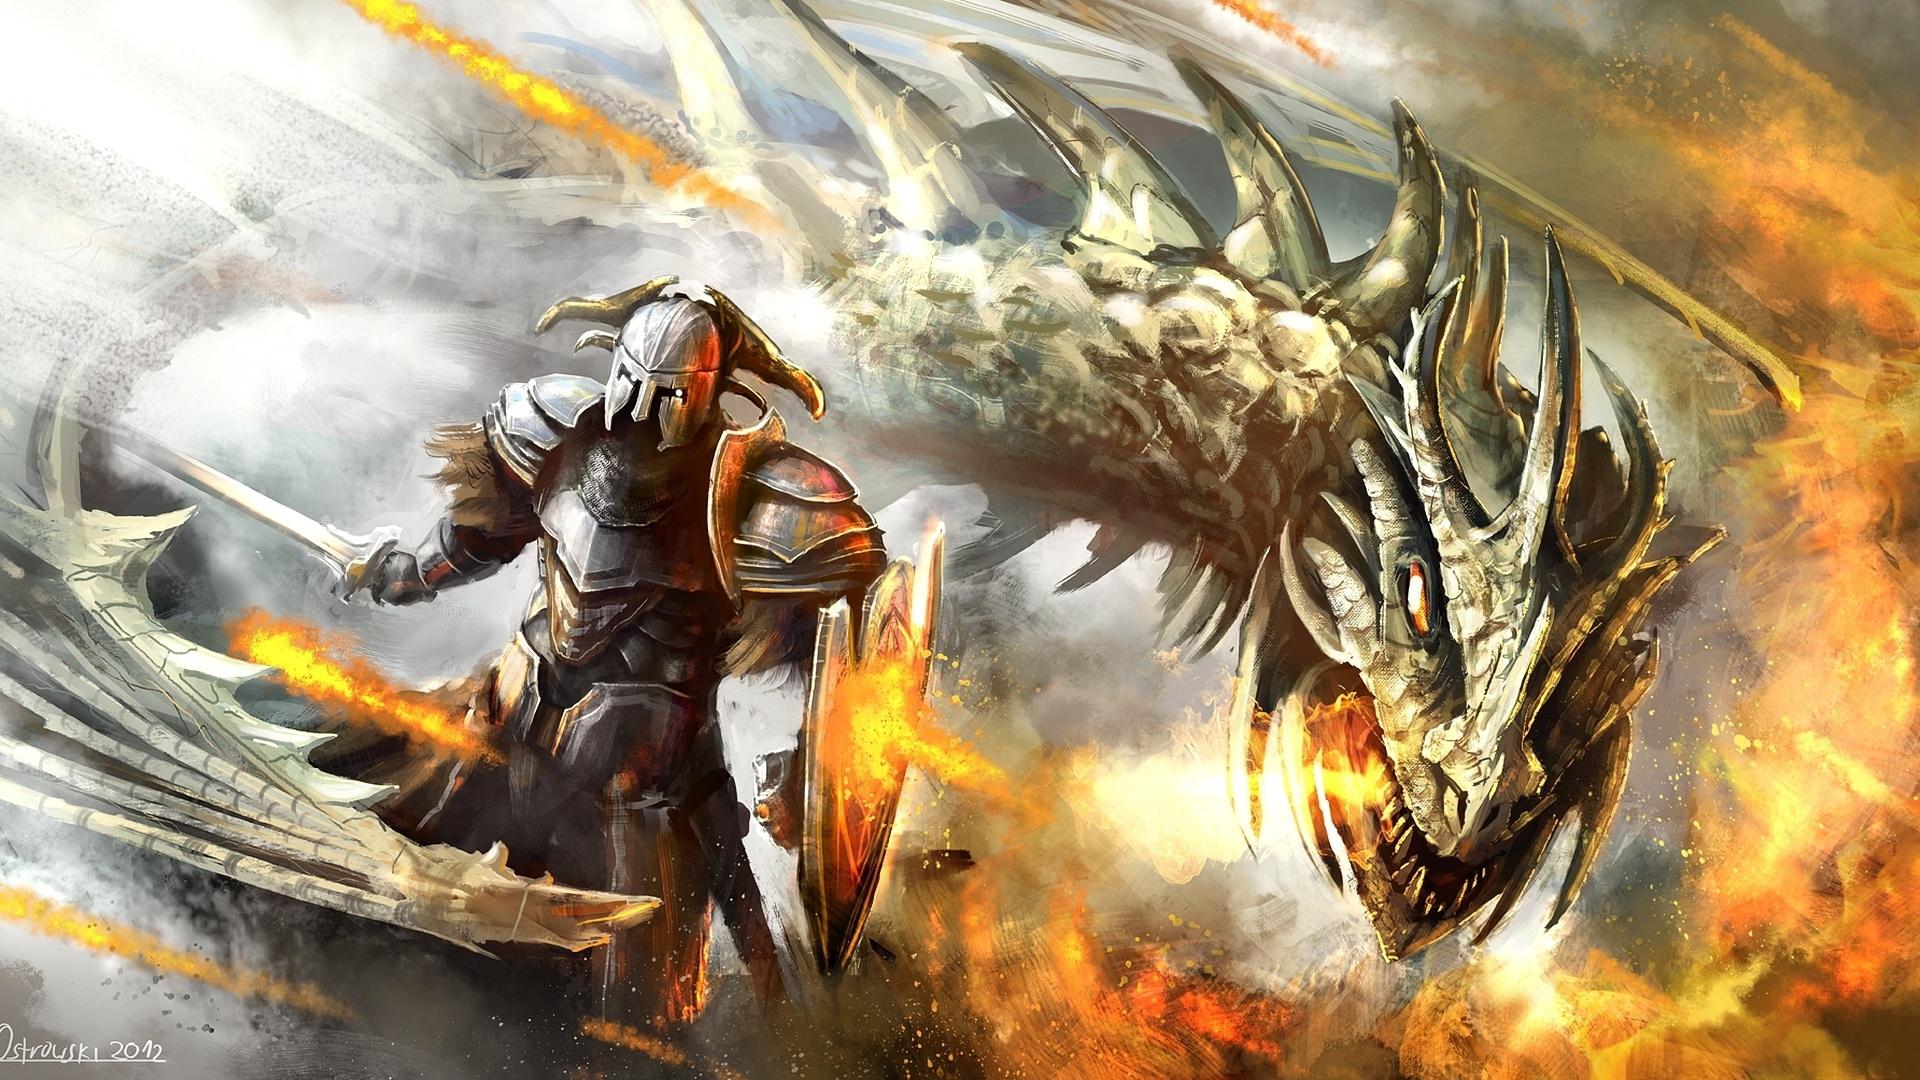 Epic fantasy wallpaper